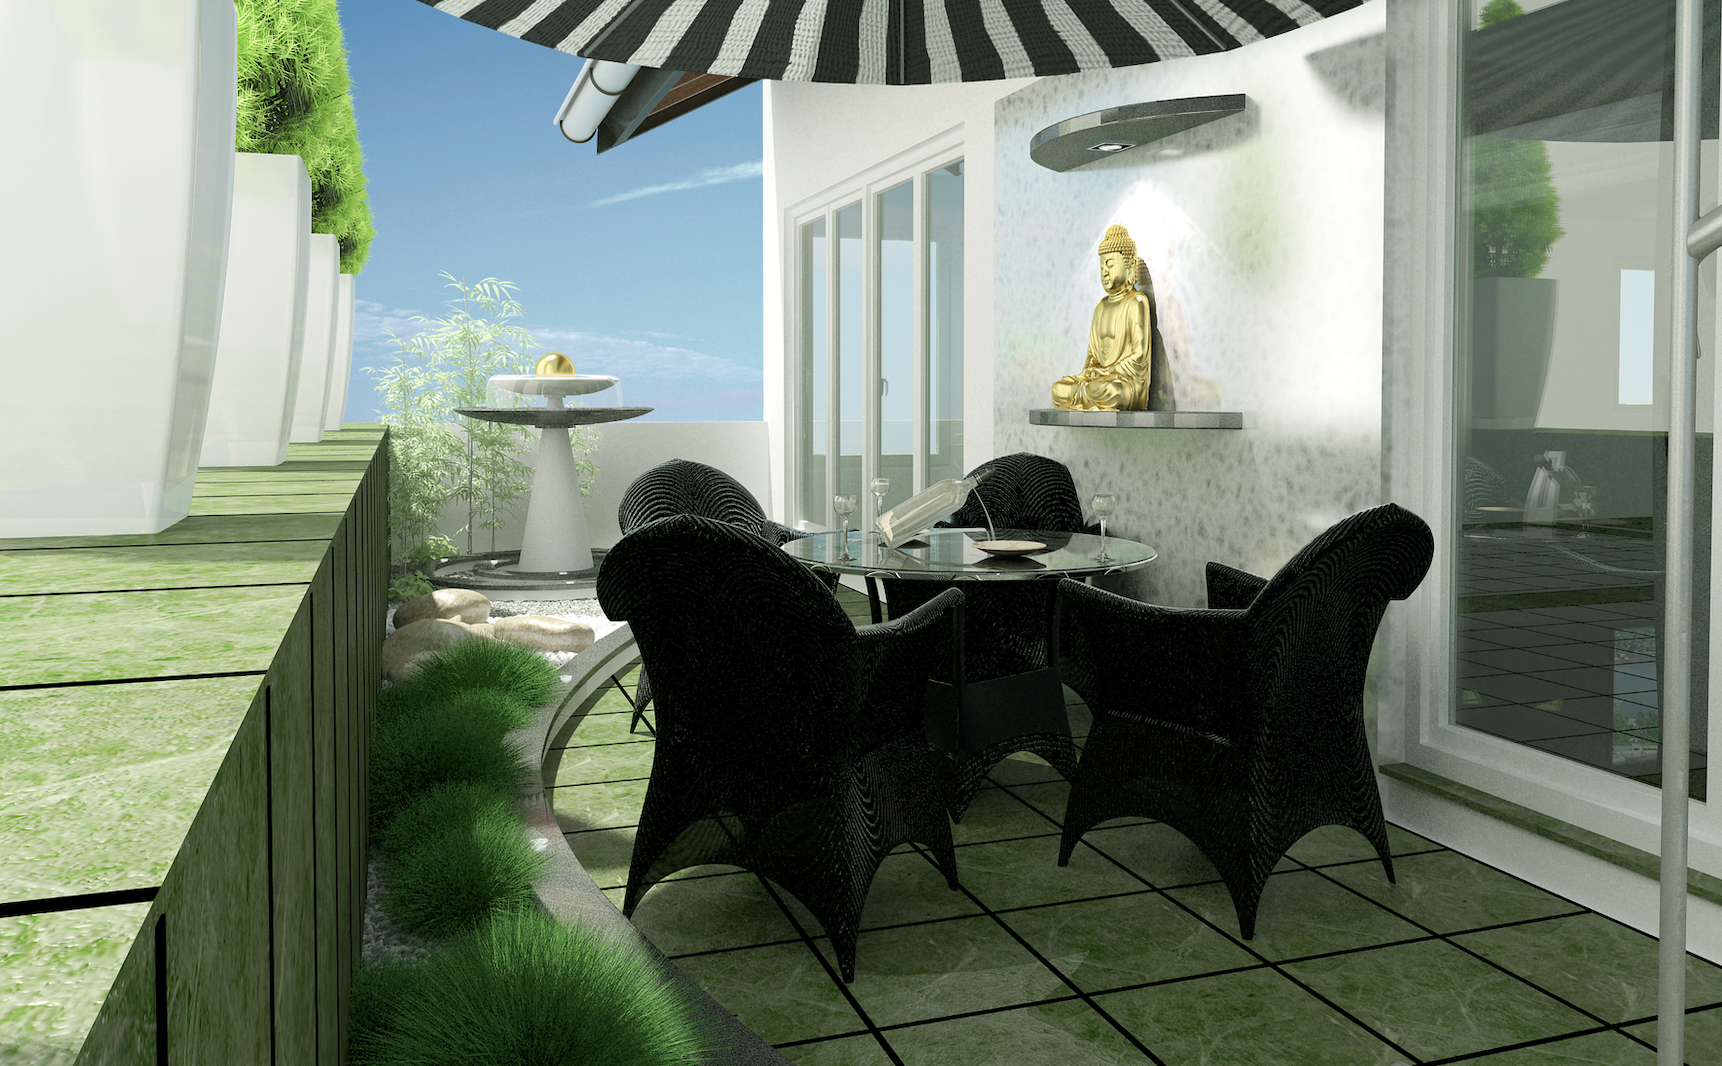 karla chacon Karla Chacon: Glamorous Modern Interior Design Ideas Karla Cachon May roof garden Hanoi Vietnam